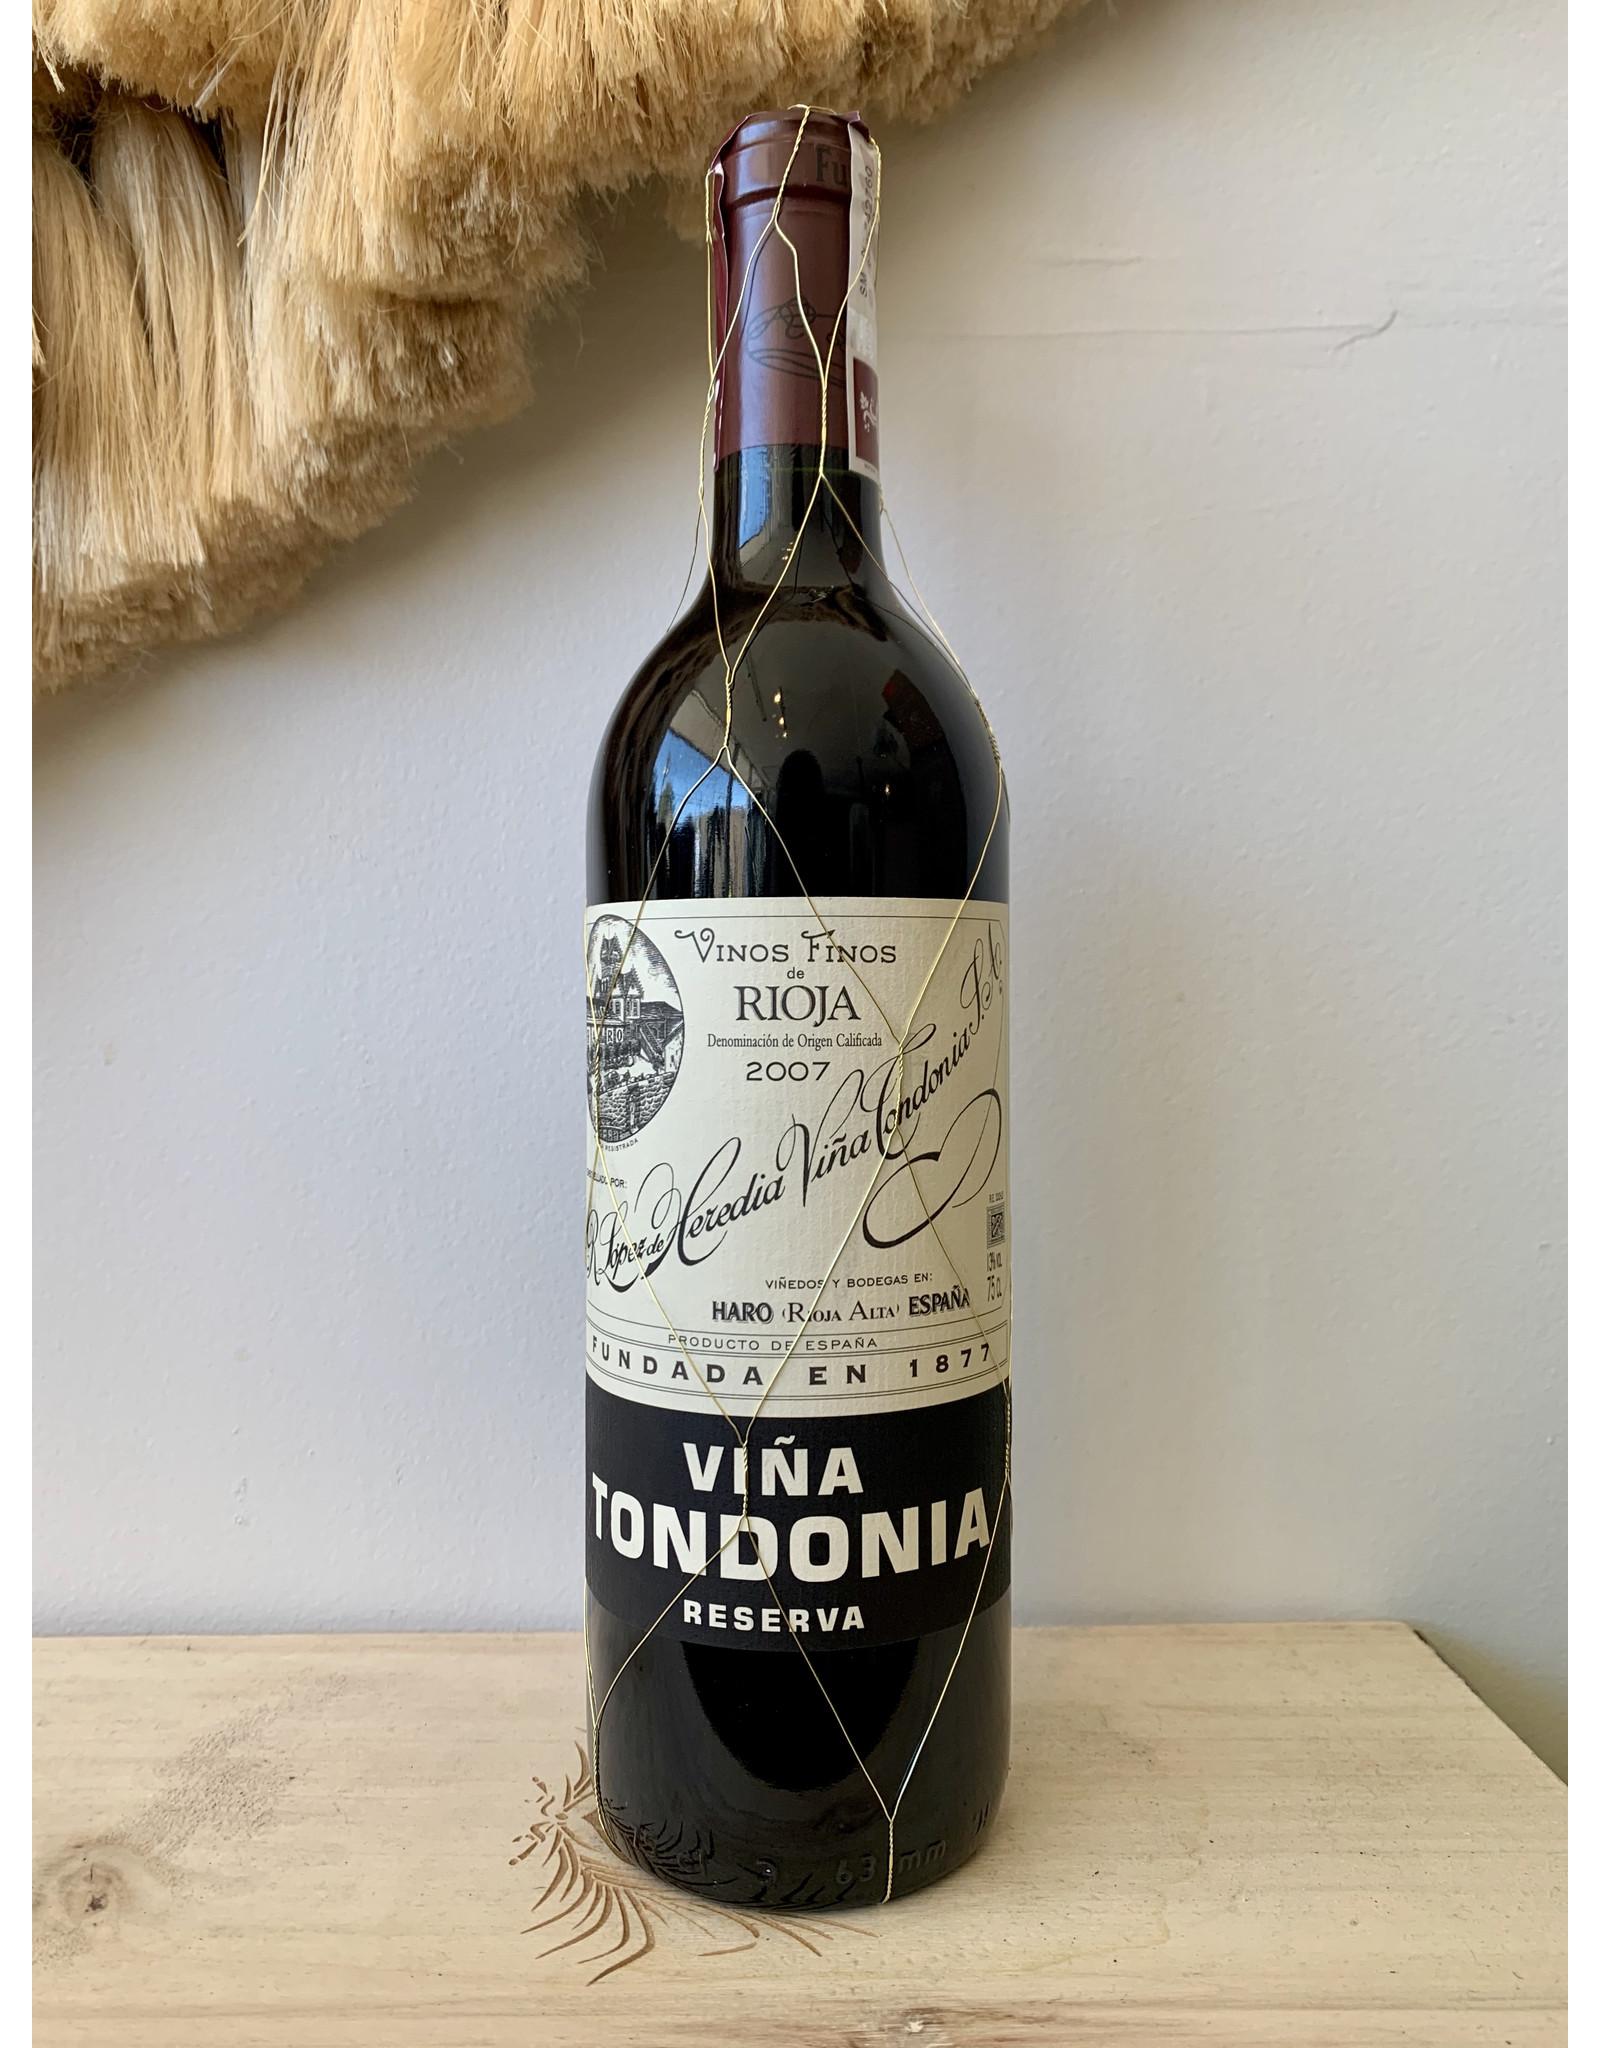 Lopez de Heredia Rioja Reserva Tinto Viña Tondonia 2008